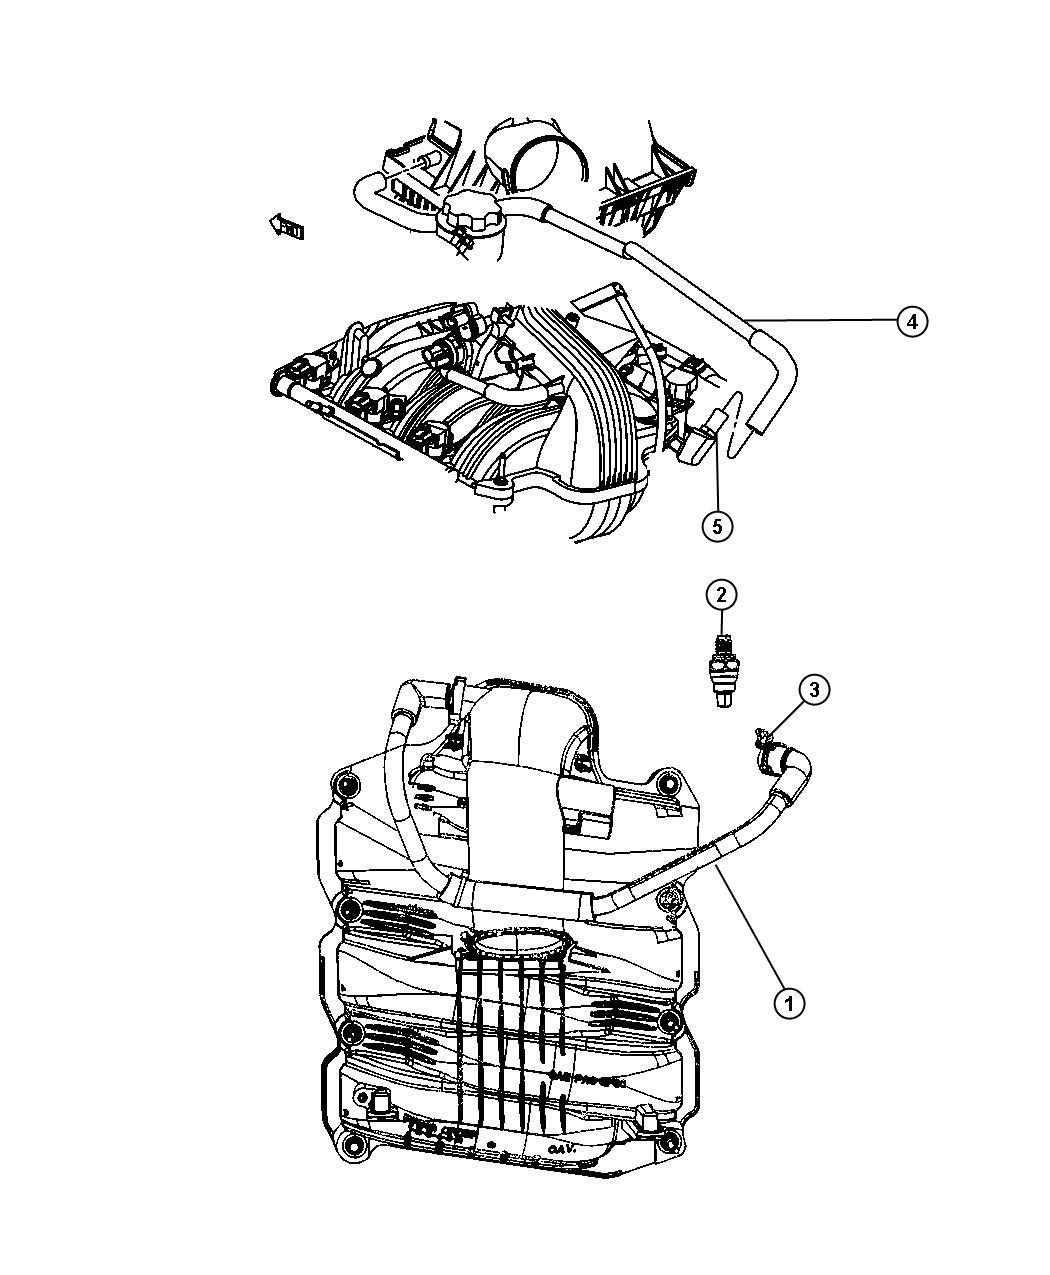 2007 Jeep Liberty Hose. Pcv valve to intake manifold